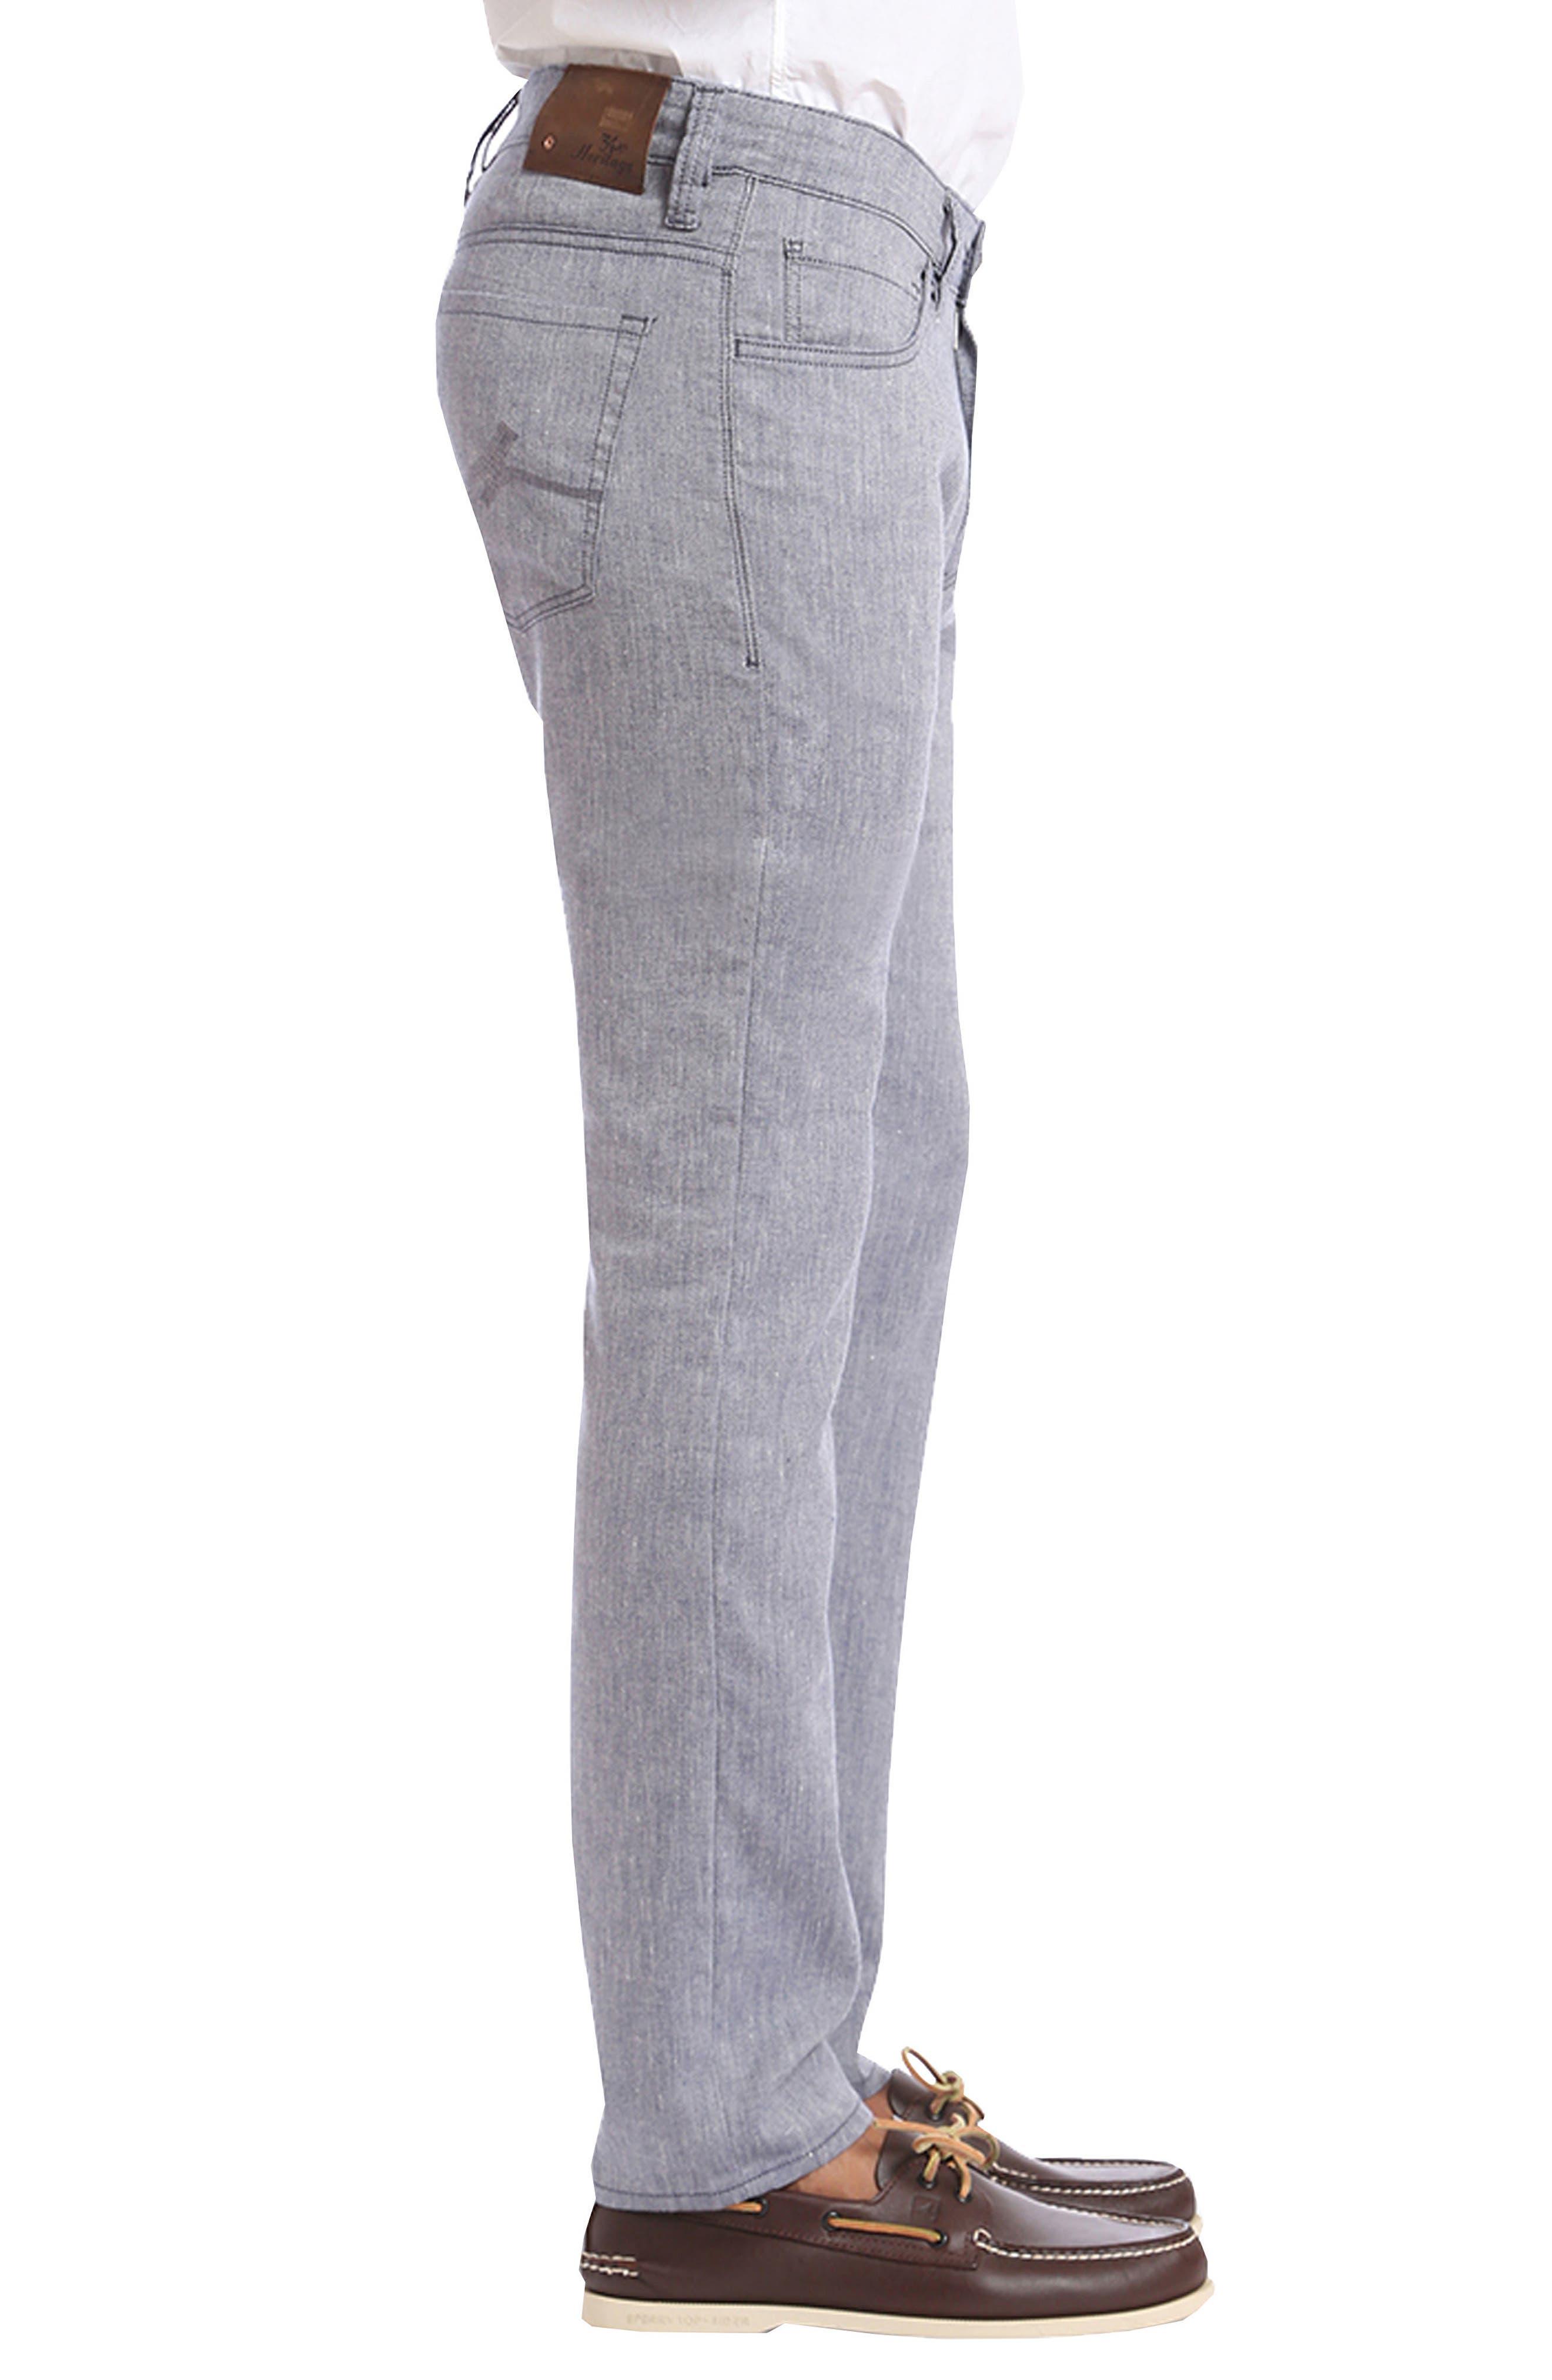 Courage Straight Leg Jeans,                             Alternate thumbnail 3, color,                             Indigo Textured